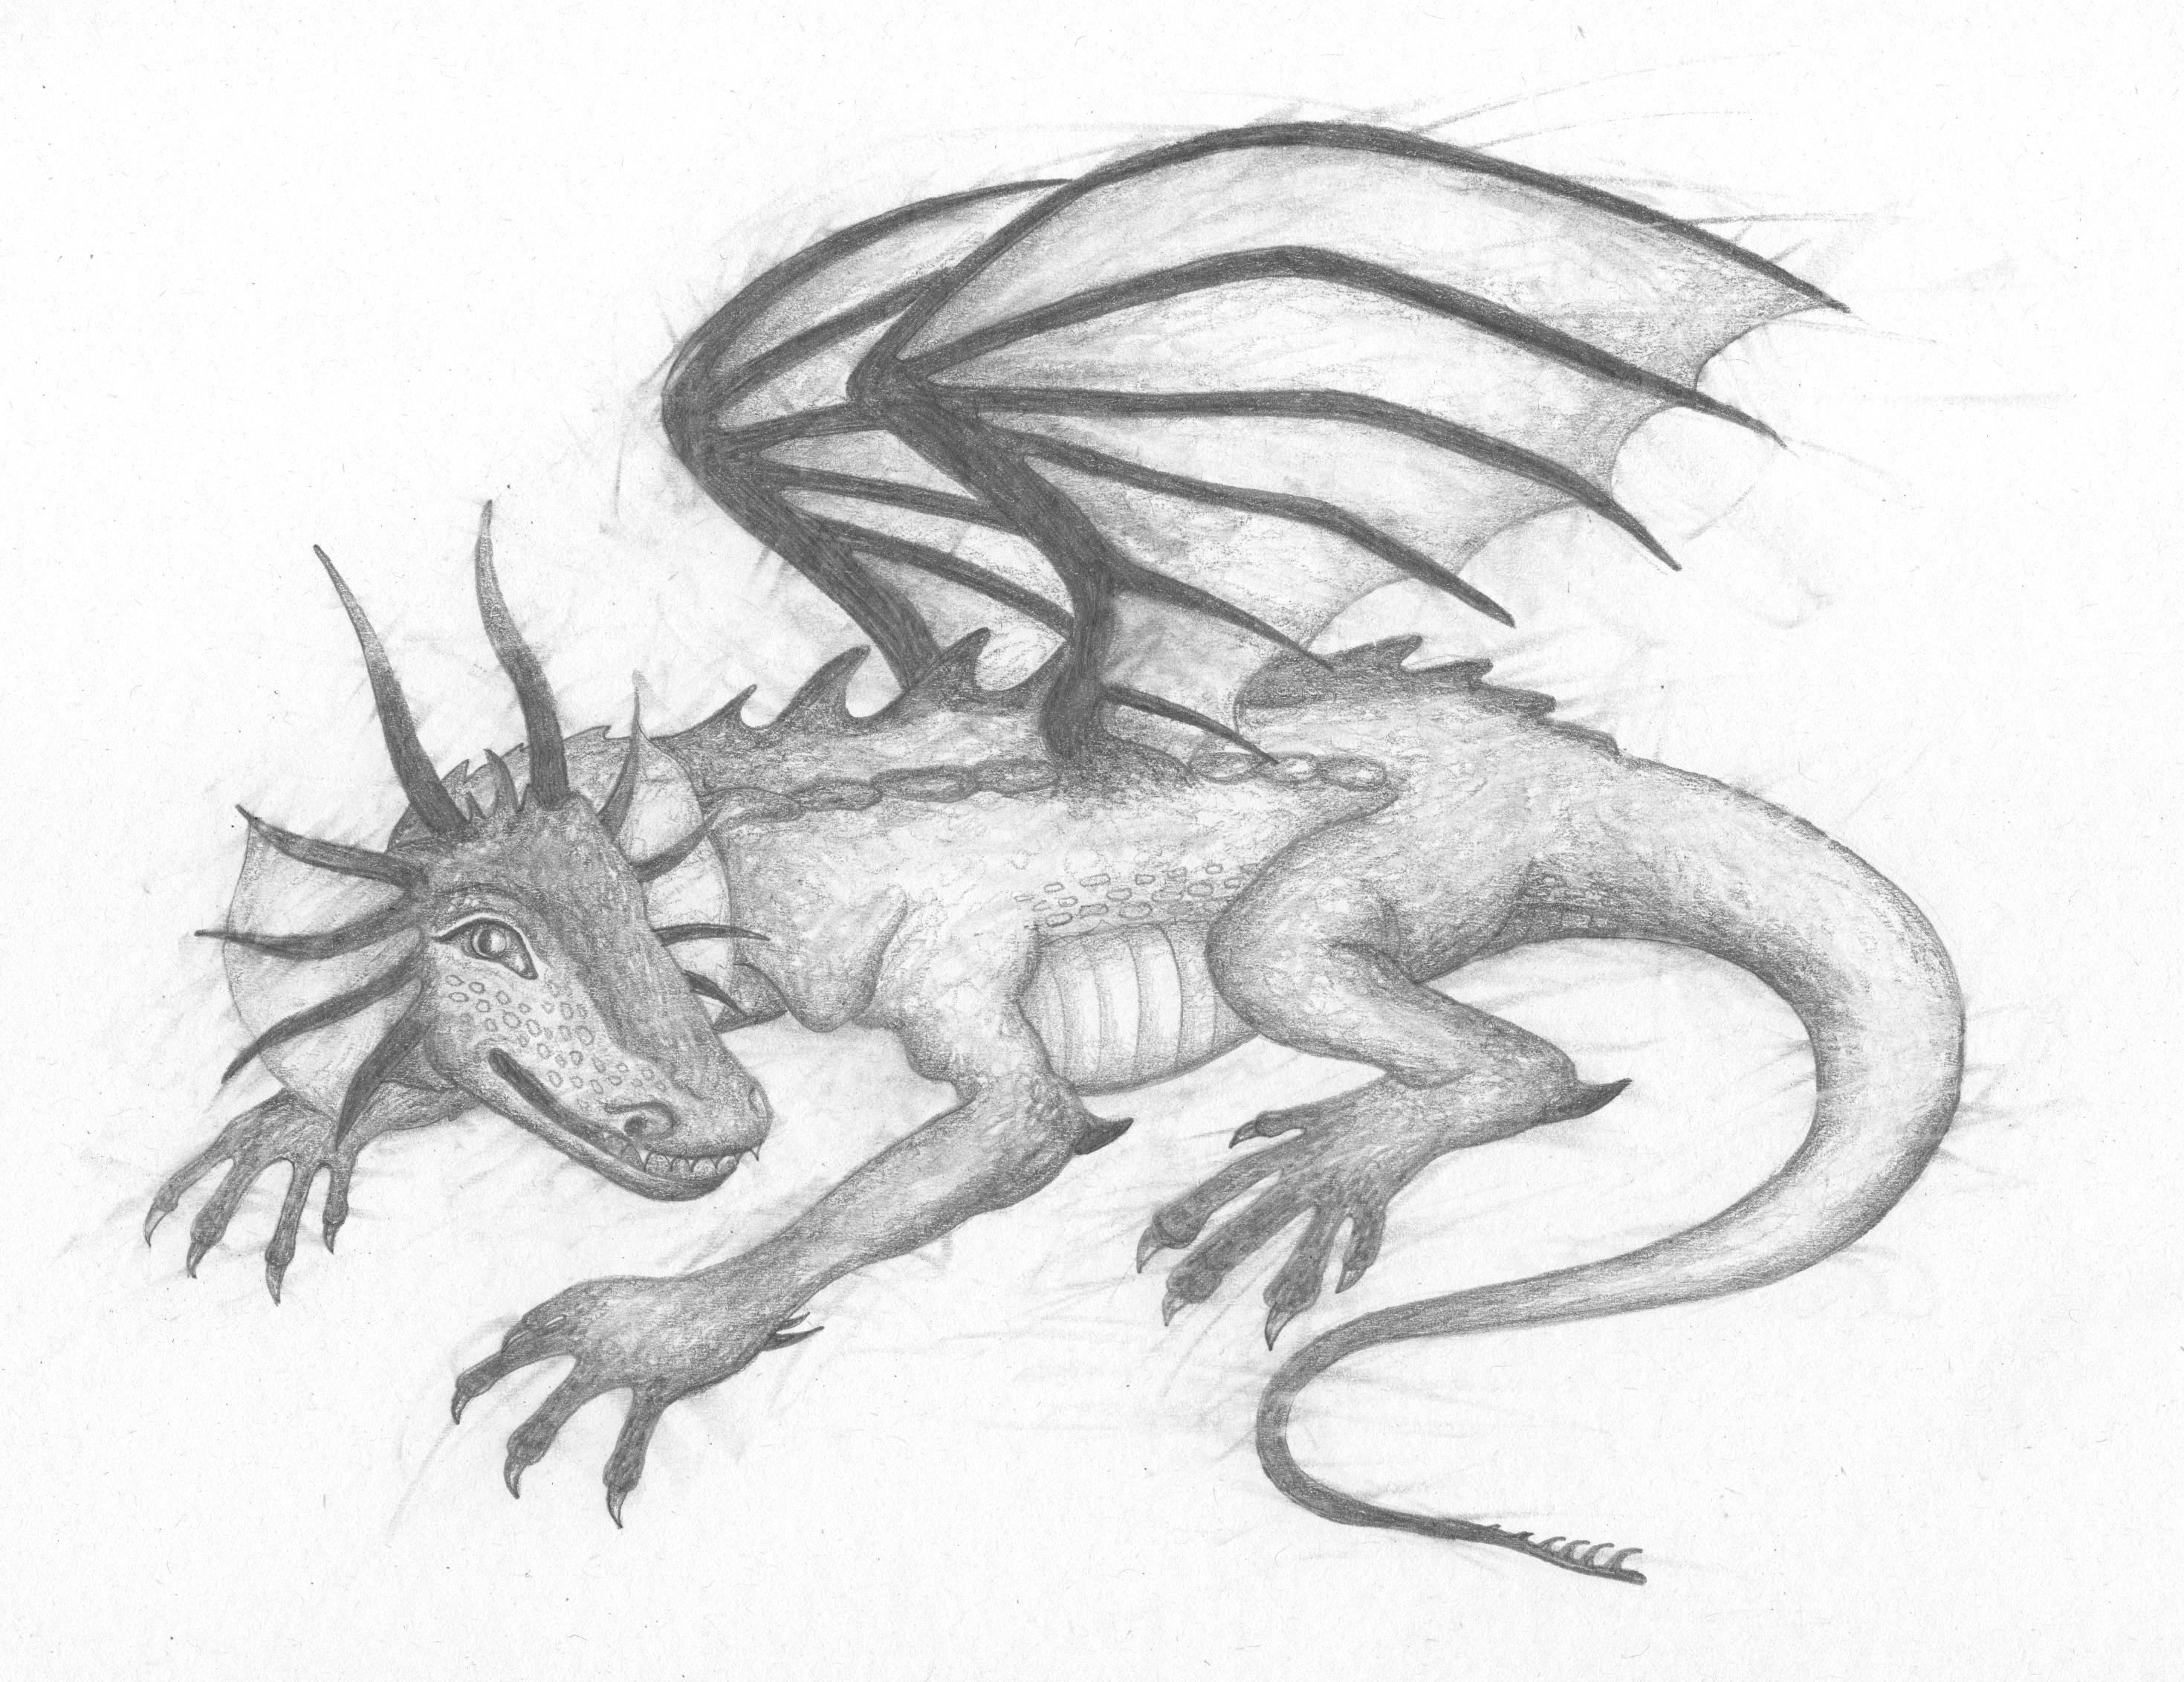 'Gorbash the Dragon'